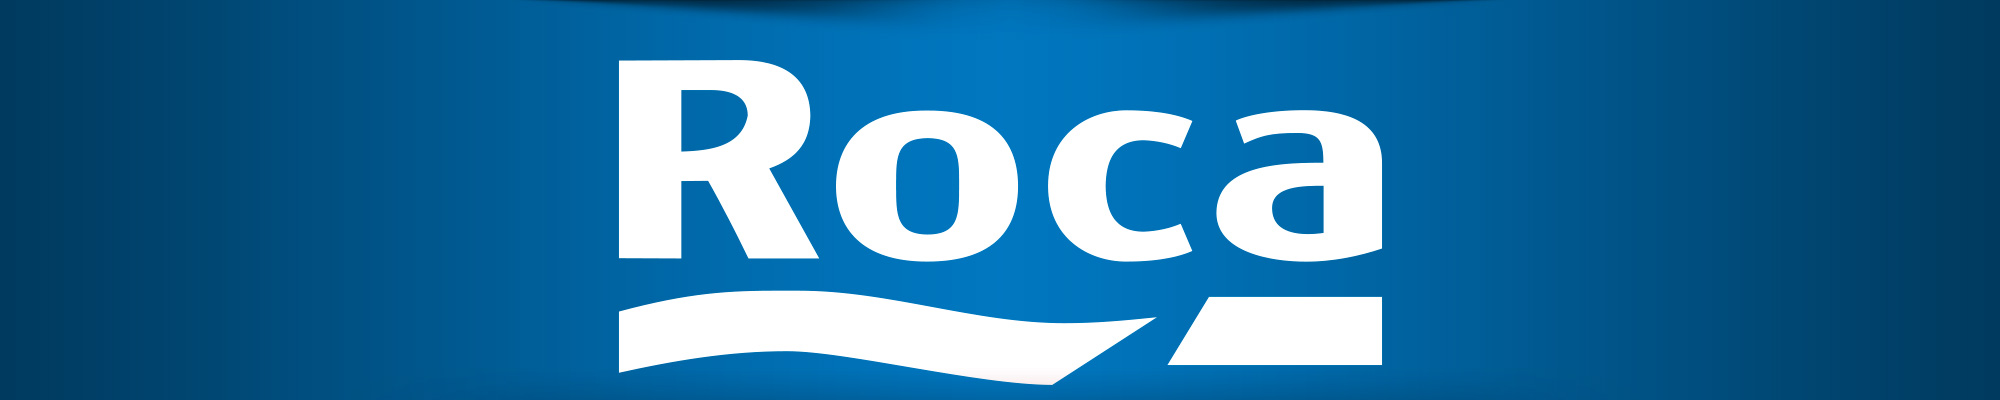 Servicio t cnico roca en mallorca for Servicio tecnico roca